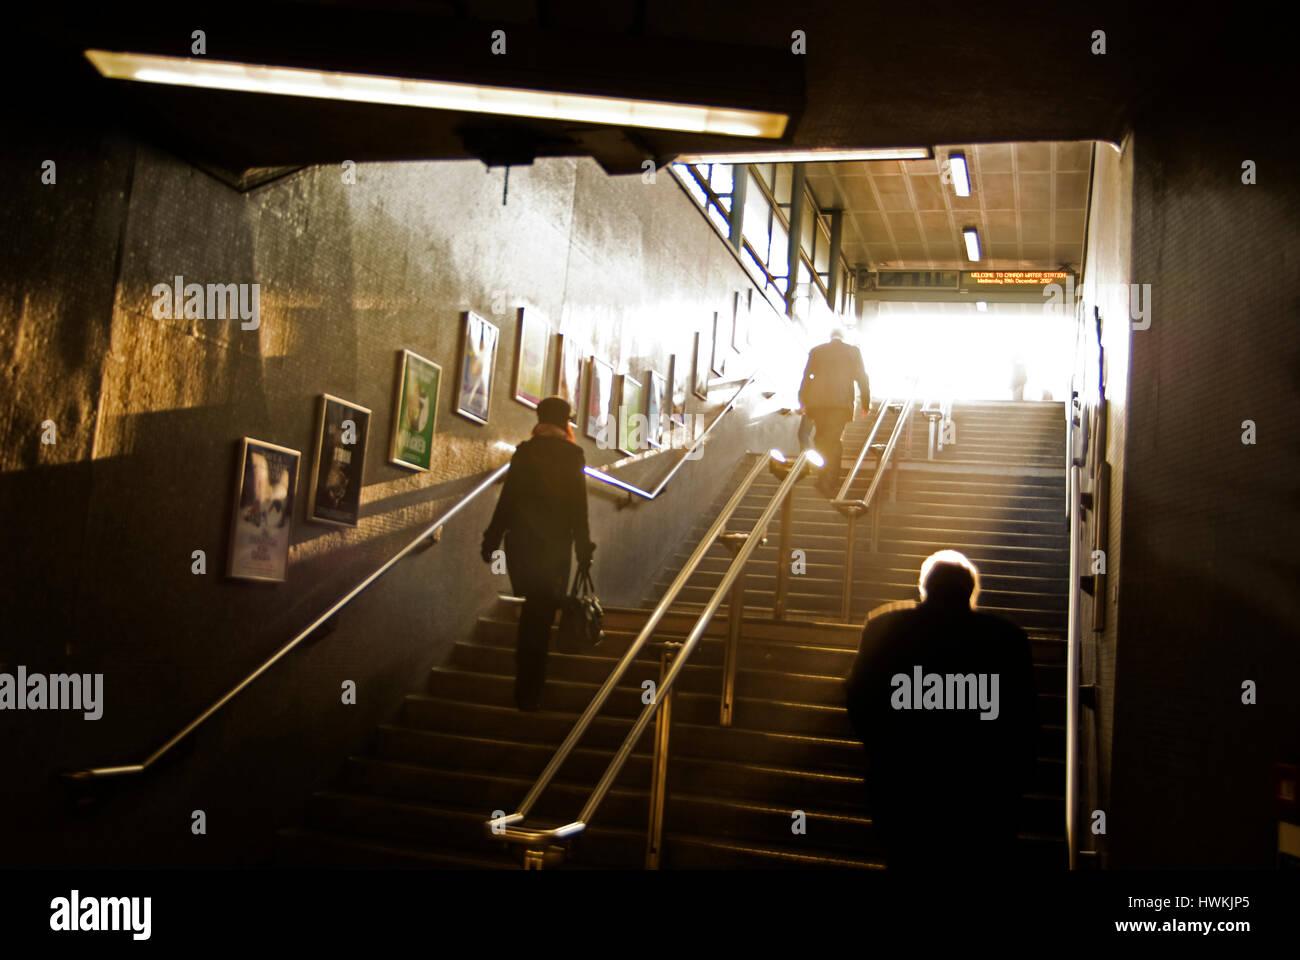 Canada Water Underground Station Jubilee Line Stock Photos